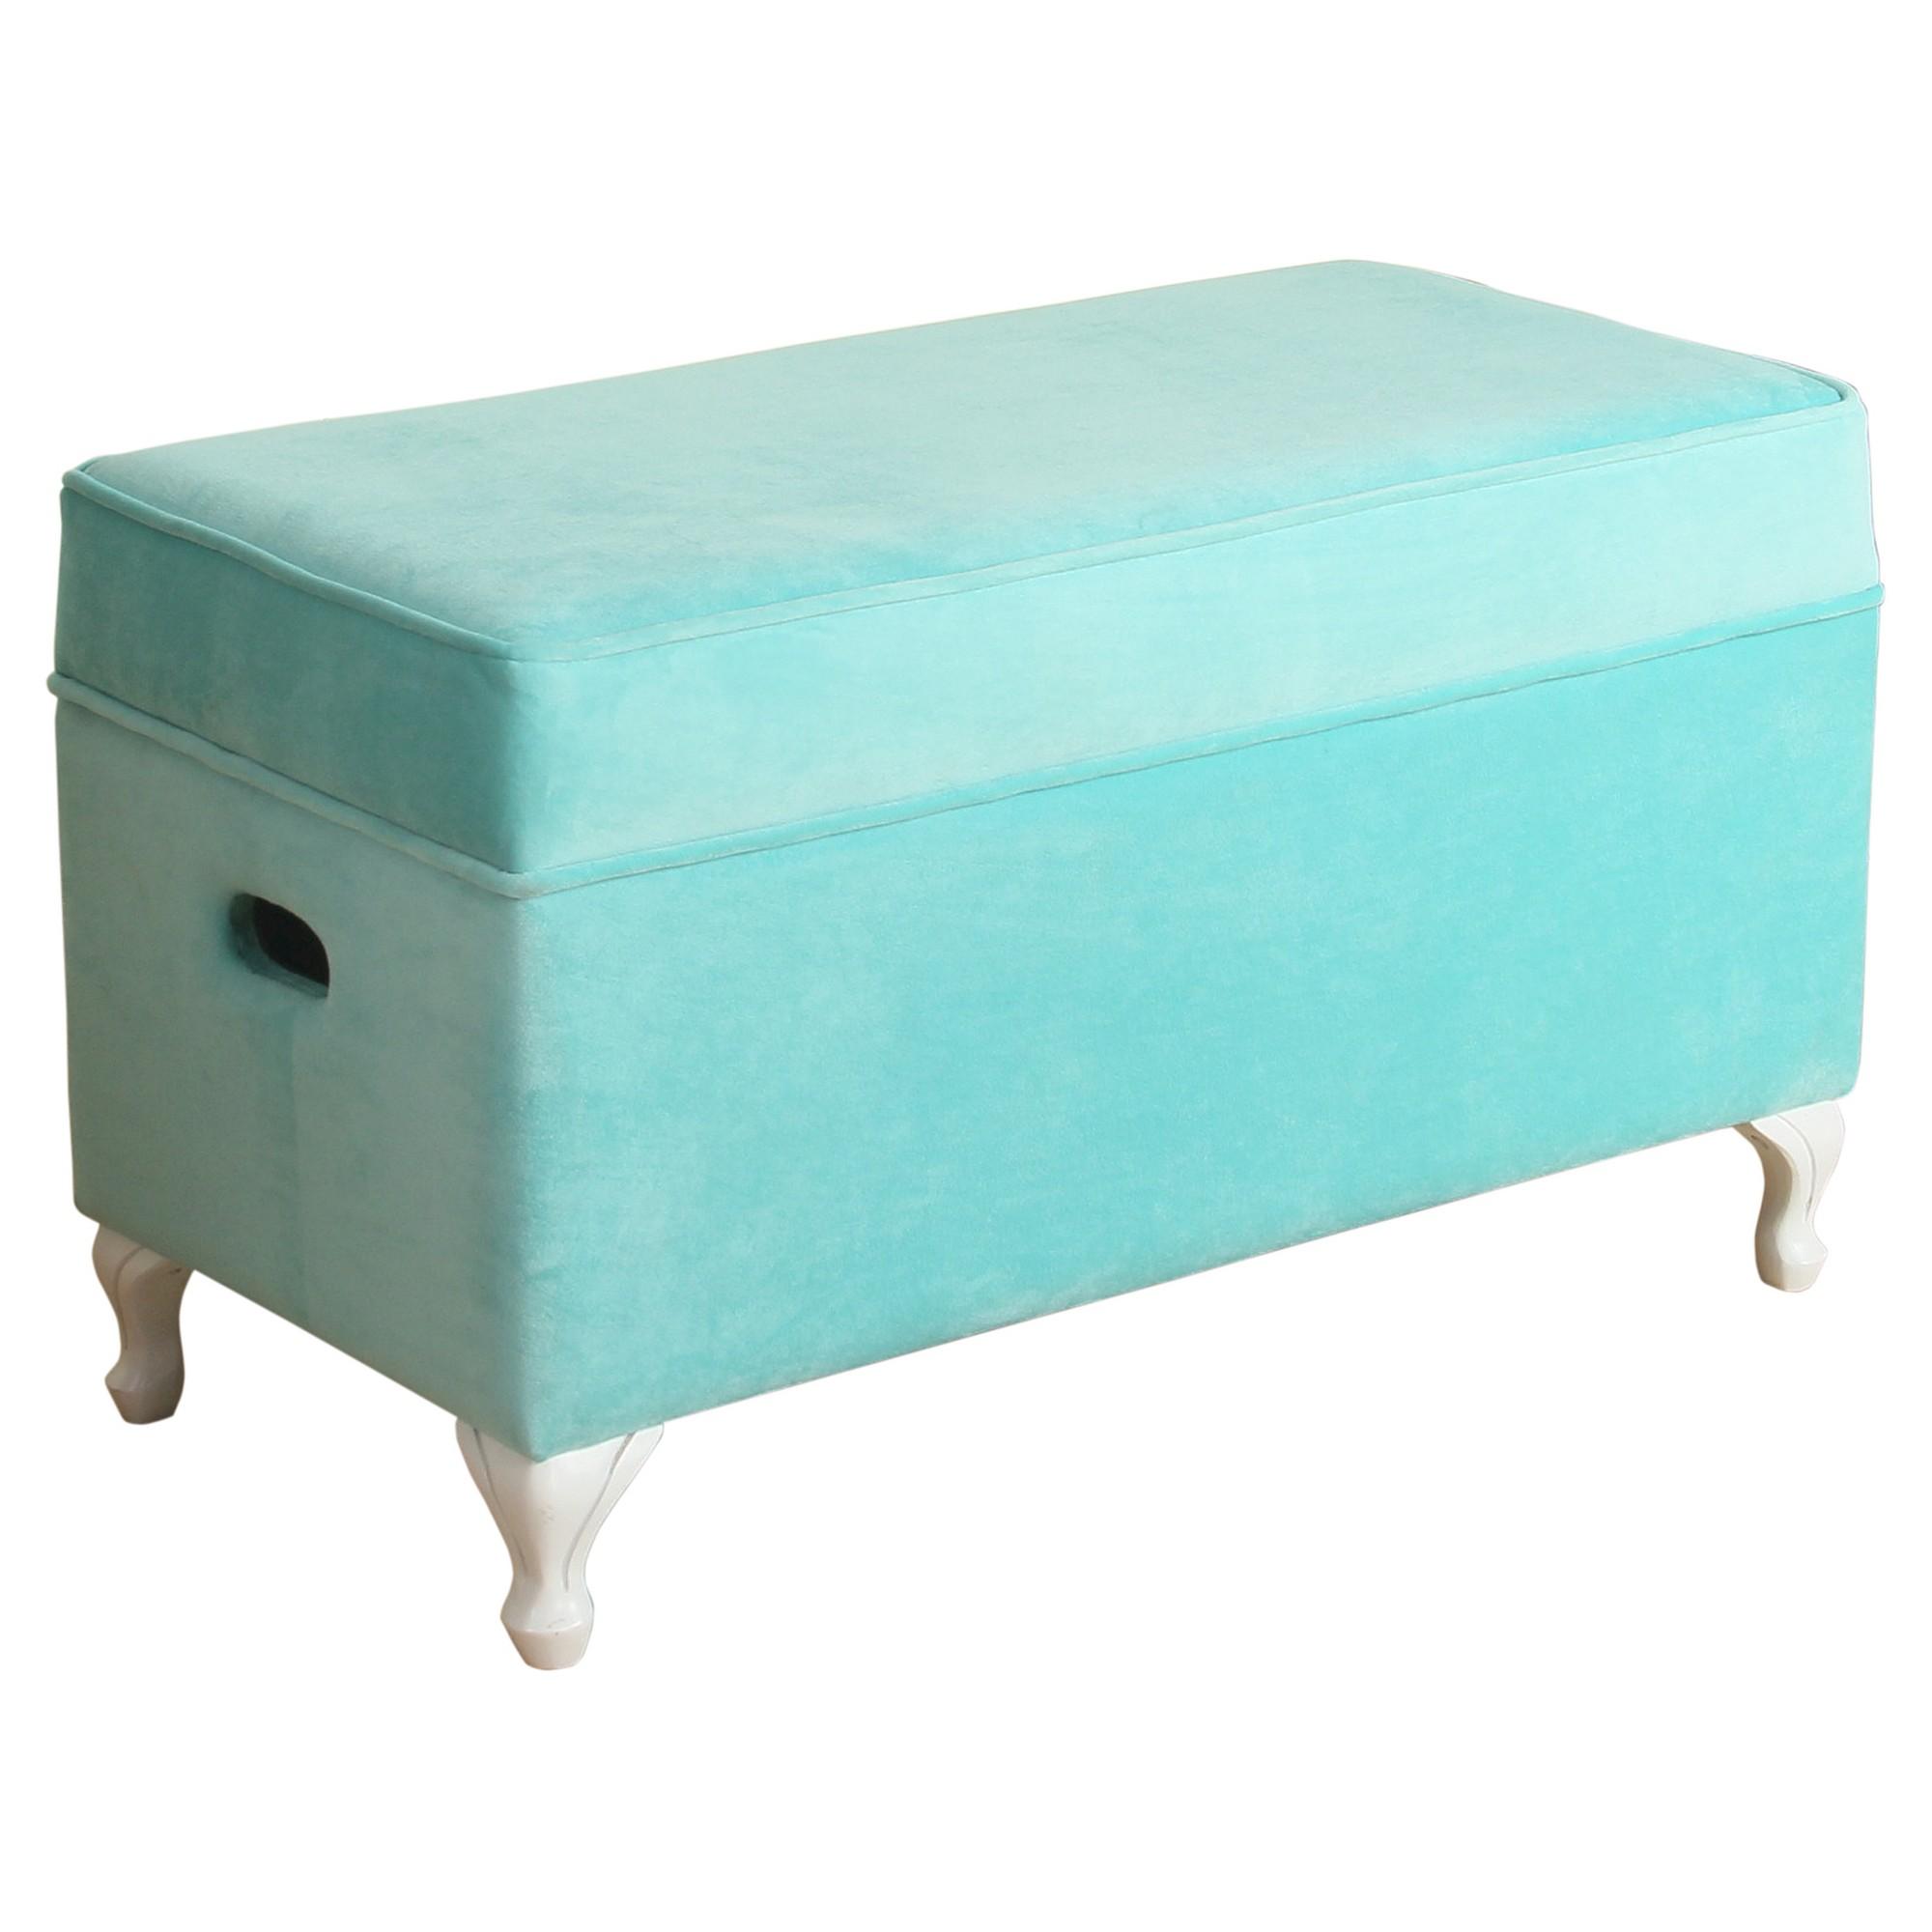 Diva Decorative Storage Bench Kids Storage Ottoman Aqua (Blue)   Homepop